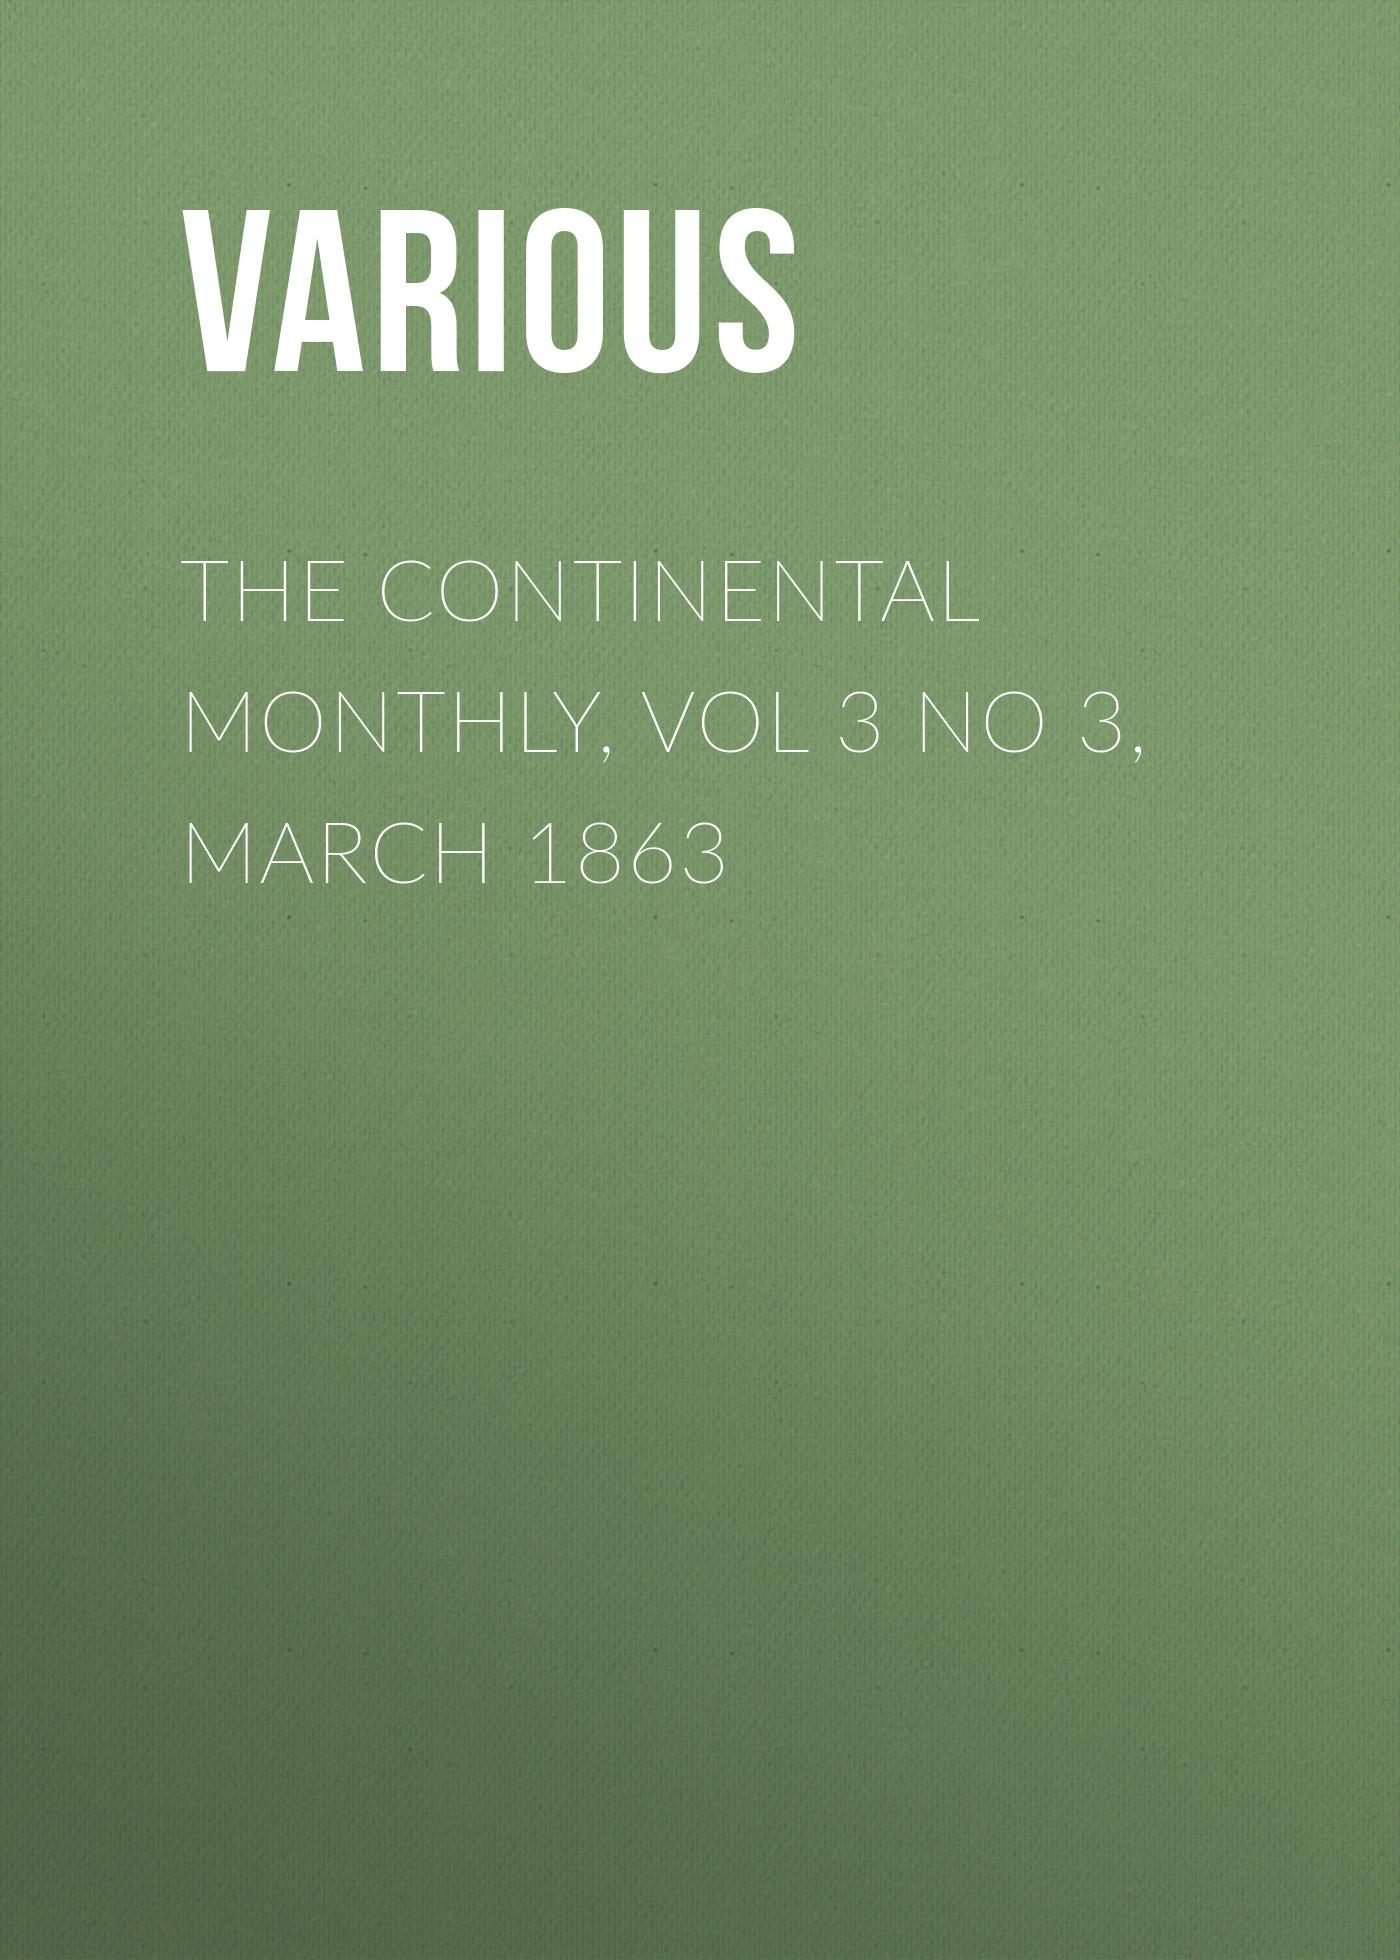 Various The Continental Monthly, Vol 3 No 3, March 1863 batman no man s land vol 3